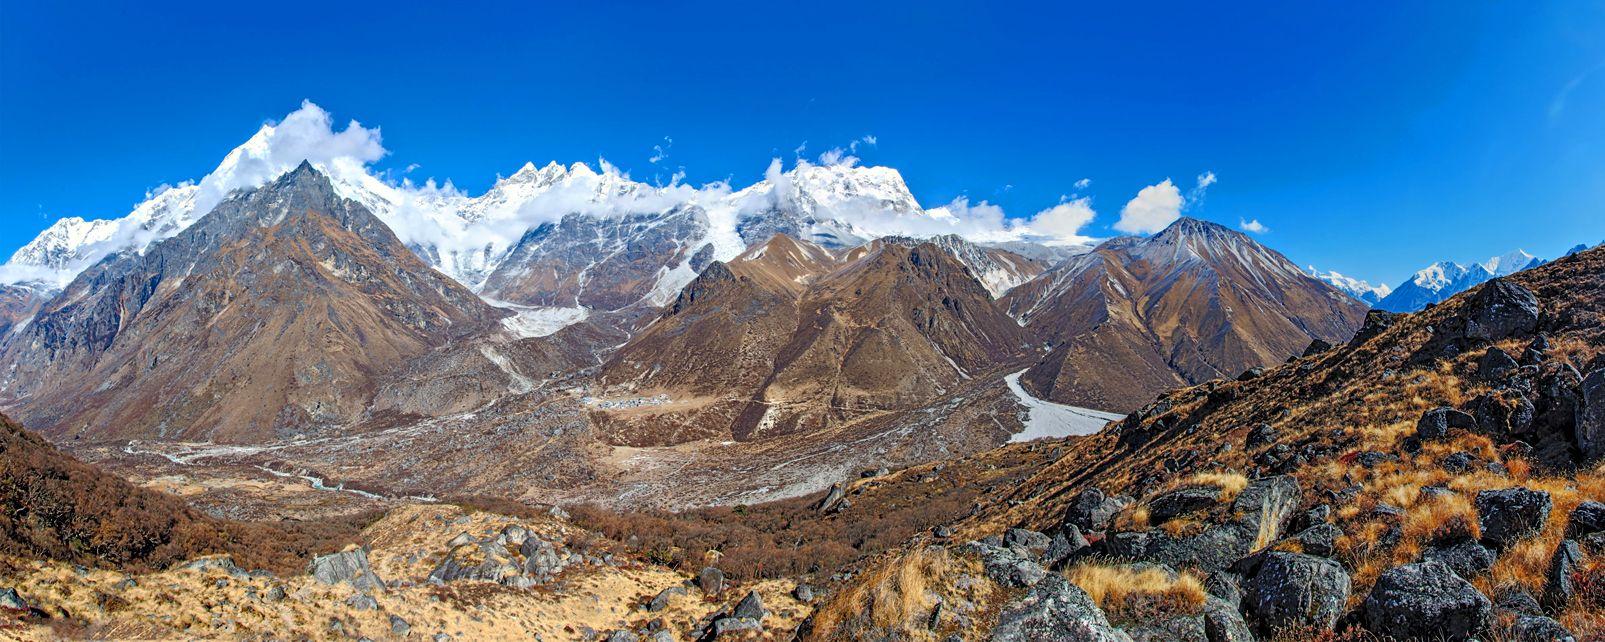 Les vallées d'Helambu et de Langtang , Les vallées d'Helambu et de Langtang, Népal , Népal